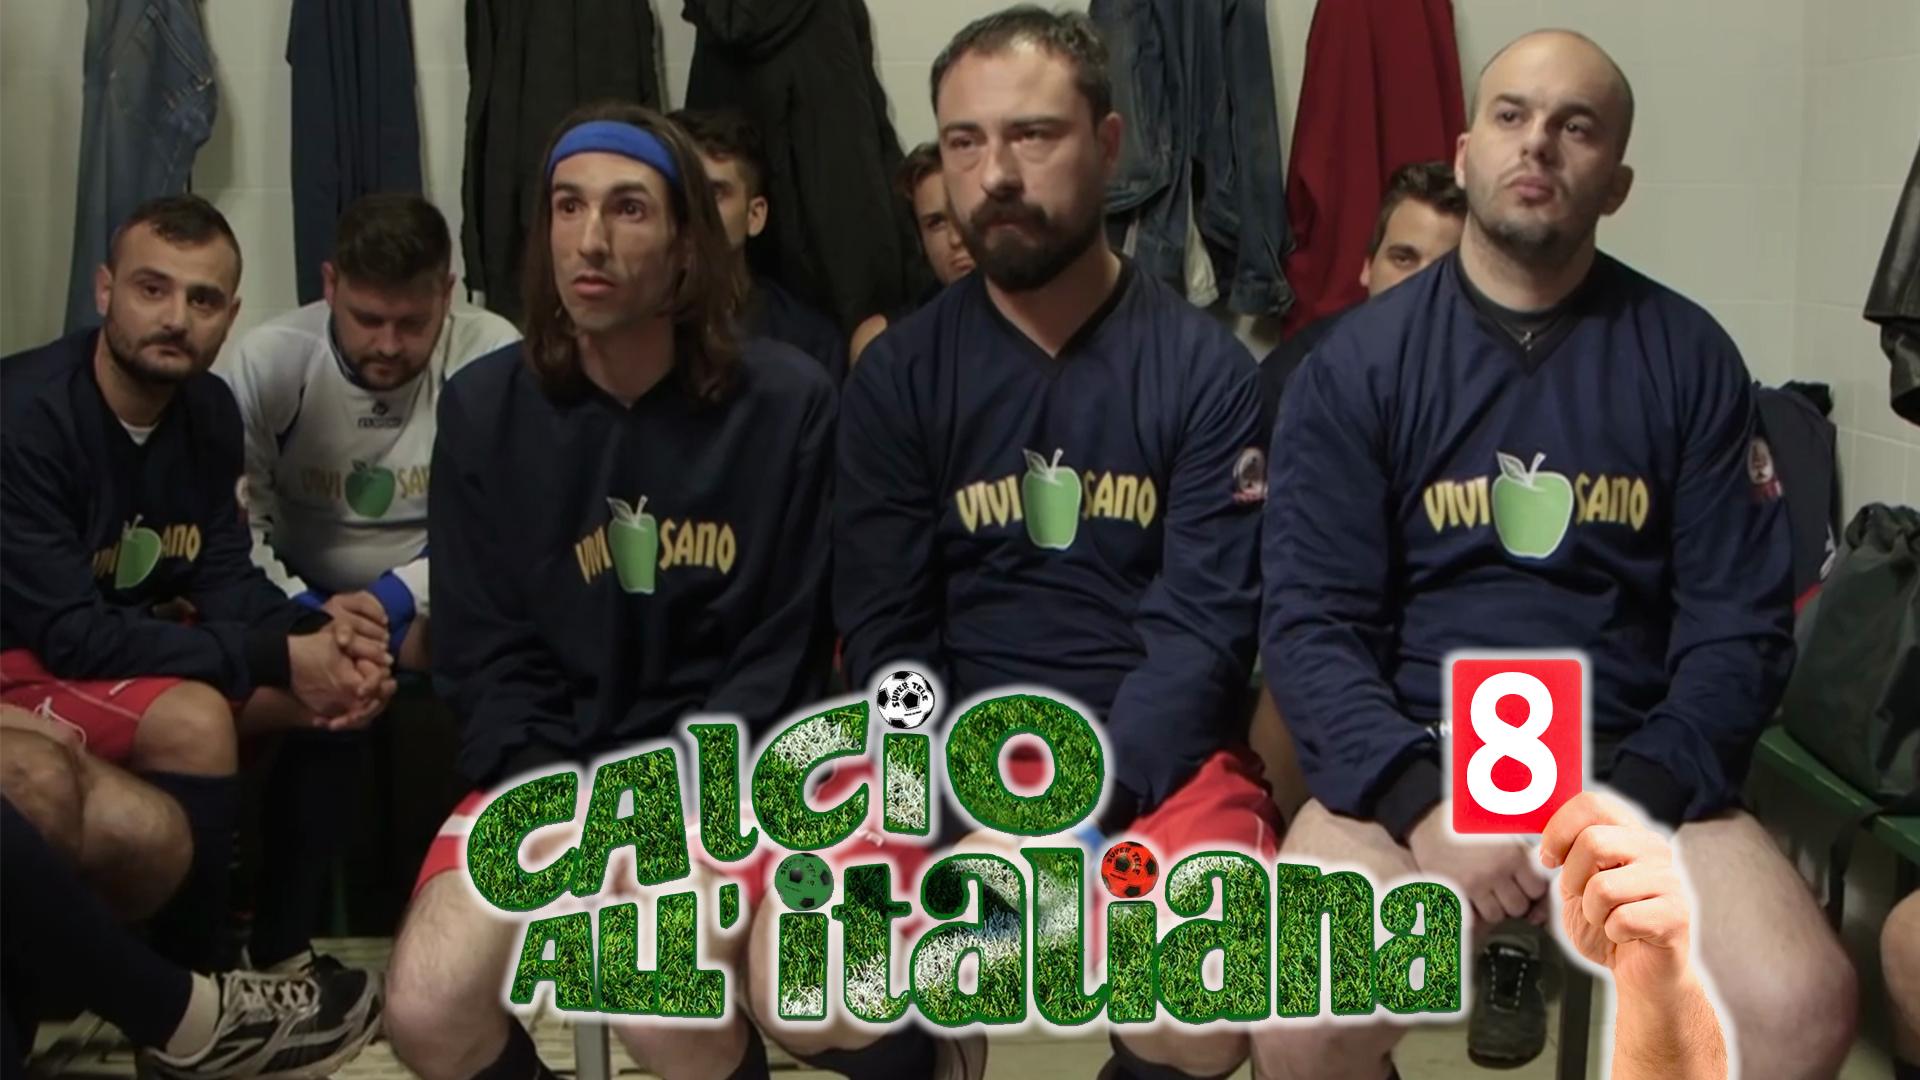 Calcio all'italiana – puntata 8